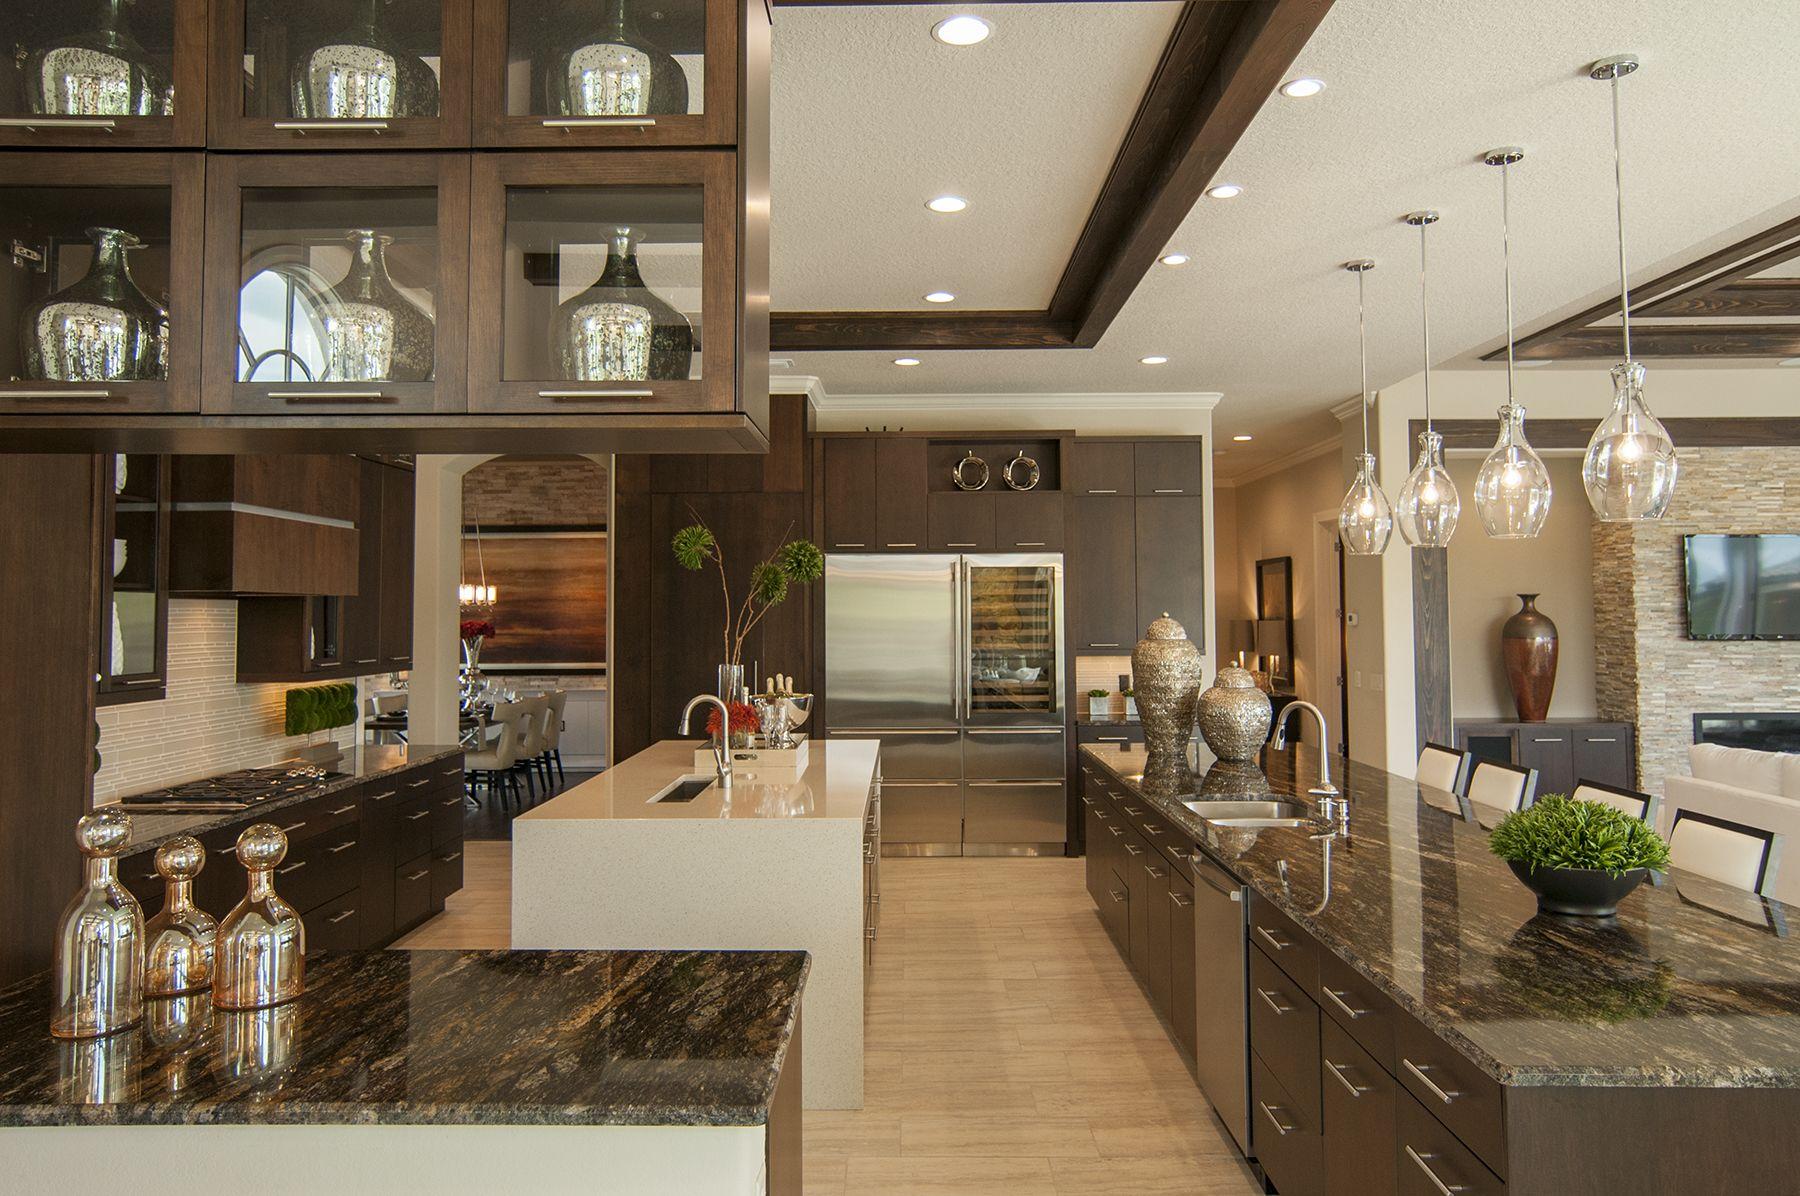 Magnificent kitchen designs with dark cabinets for Great kitchen designs